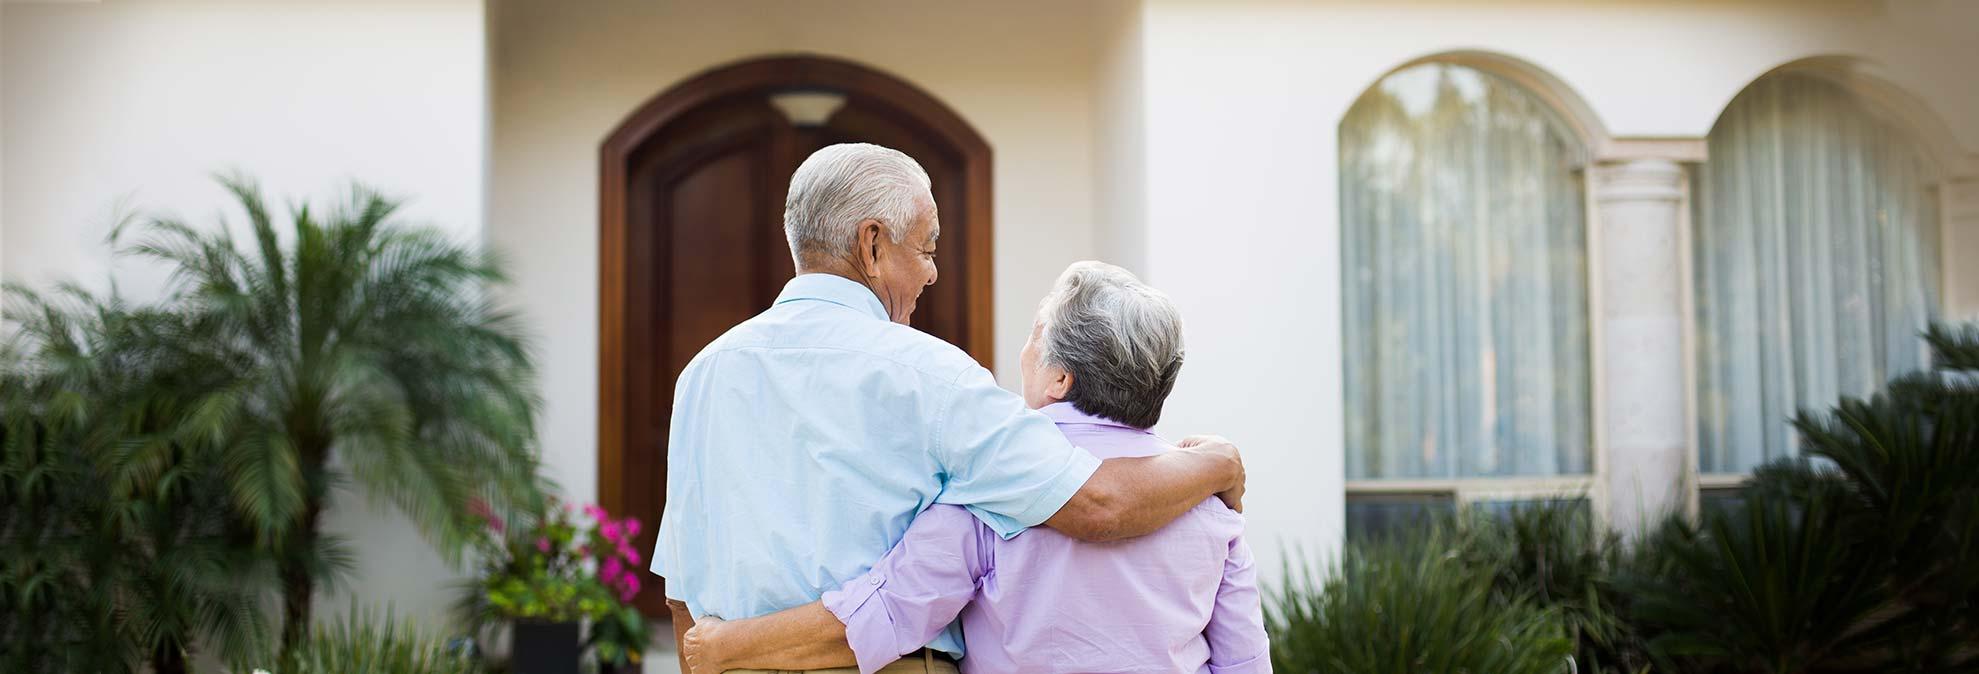 Make Your Home Elder-Friendly